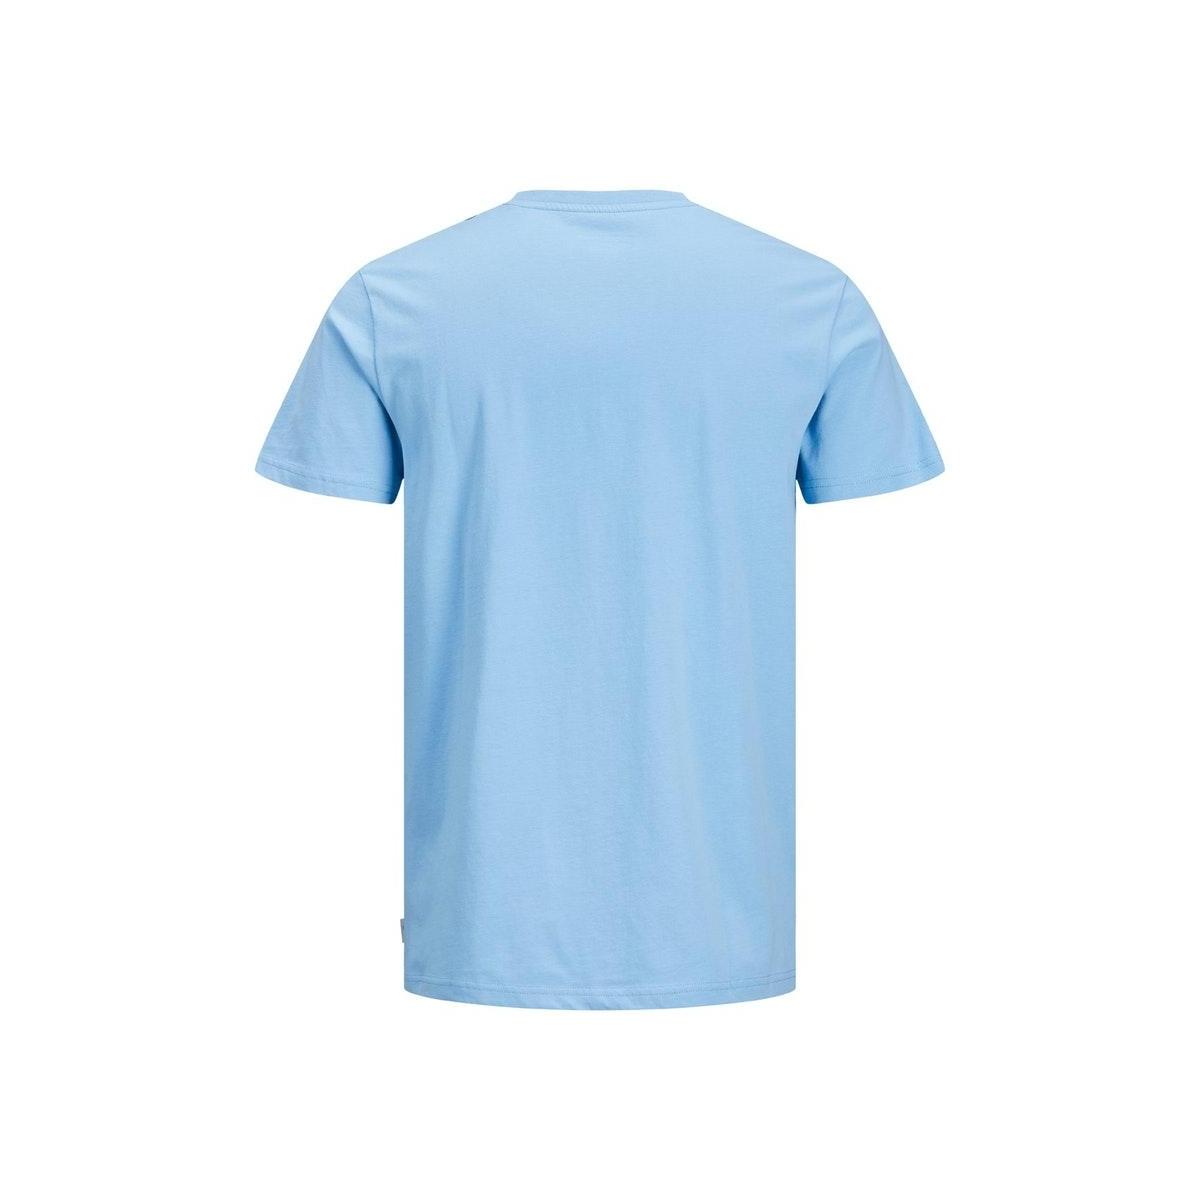 jcologo-universe tee ss crew  neck 12172273 jack & jones t-shirt dusk blue/slim/logo